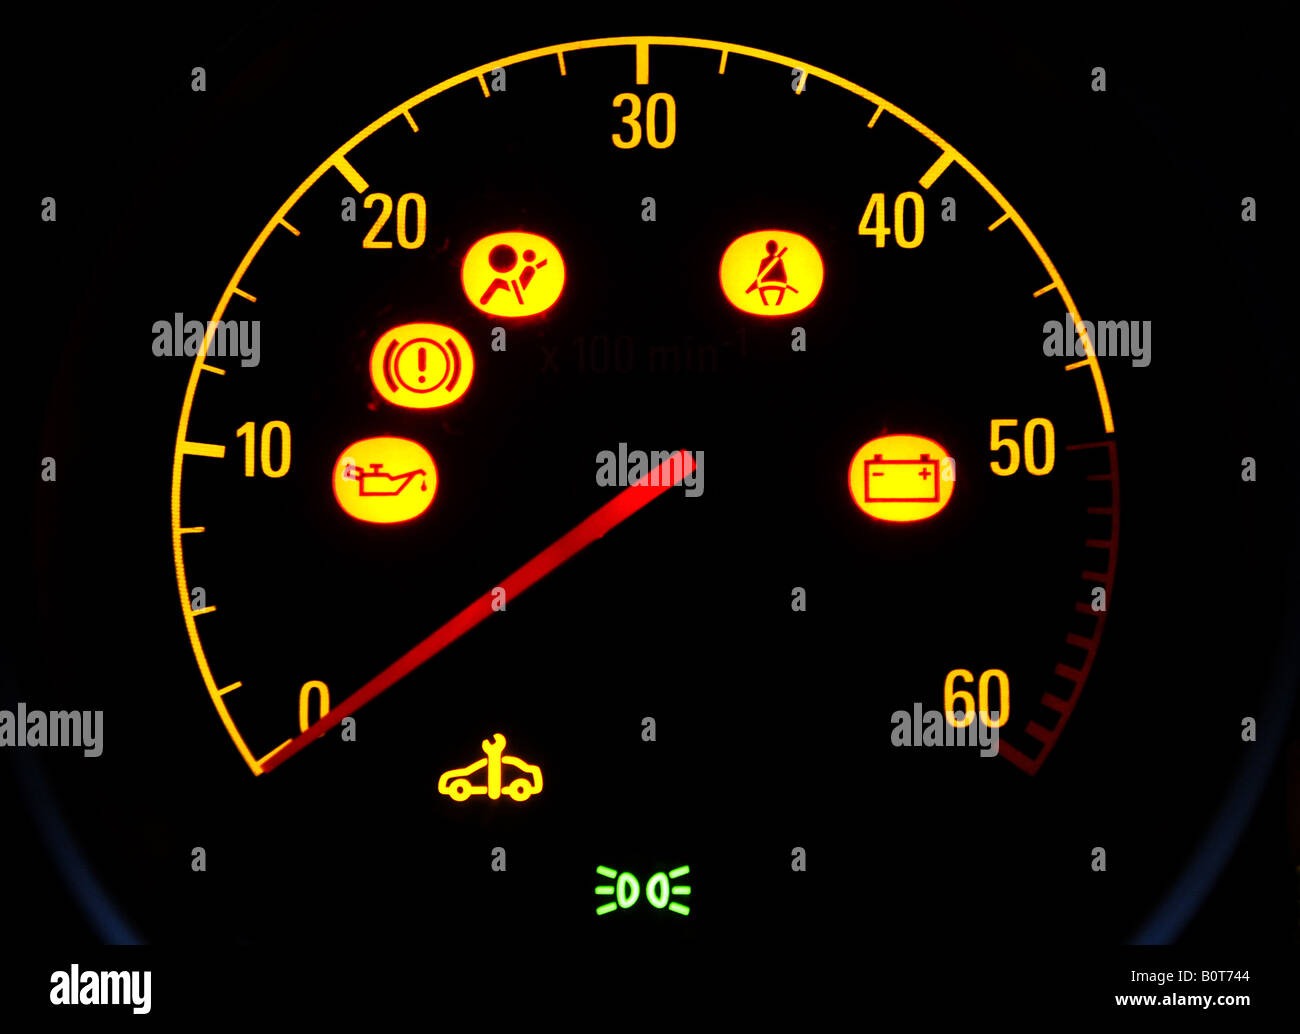 Car rev counter with illuminated warning symbolsuk stock photo car rev counter with illuminated warning symbolsuk buycottarizona